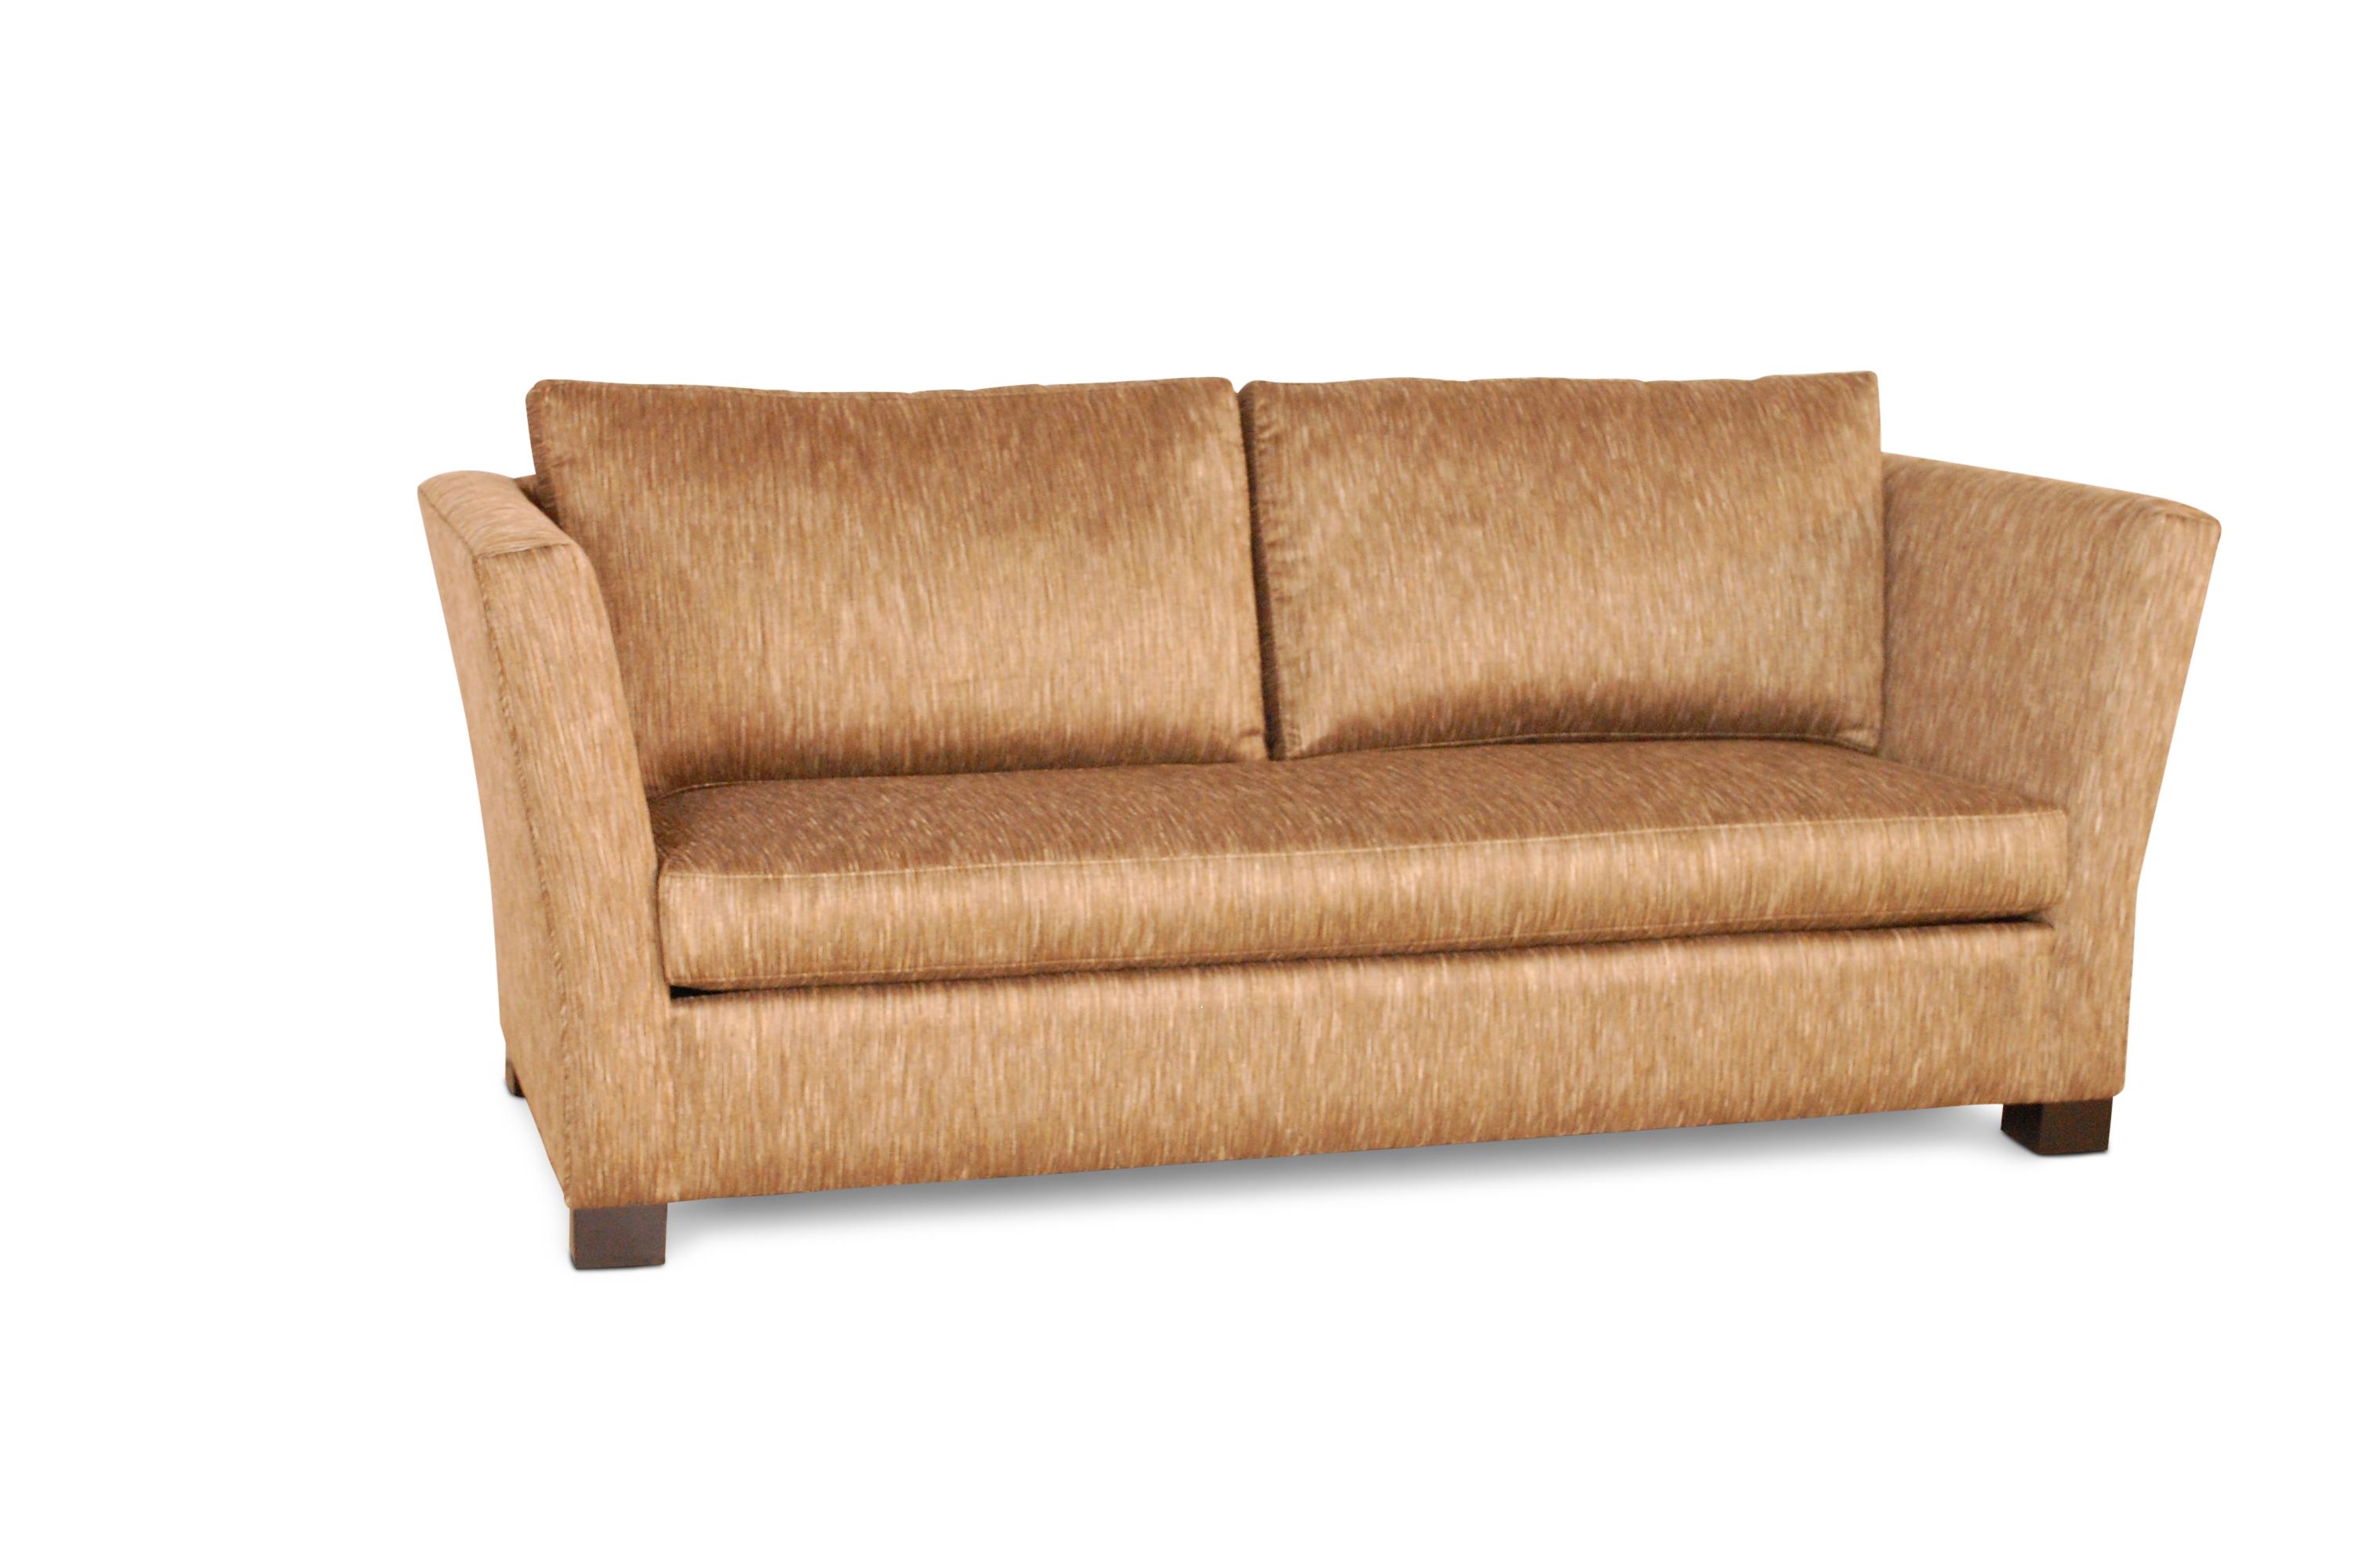 Sofas en madrid capital good sofas en madrid capital with for Sofas baratos alicante